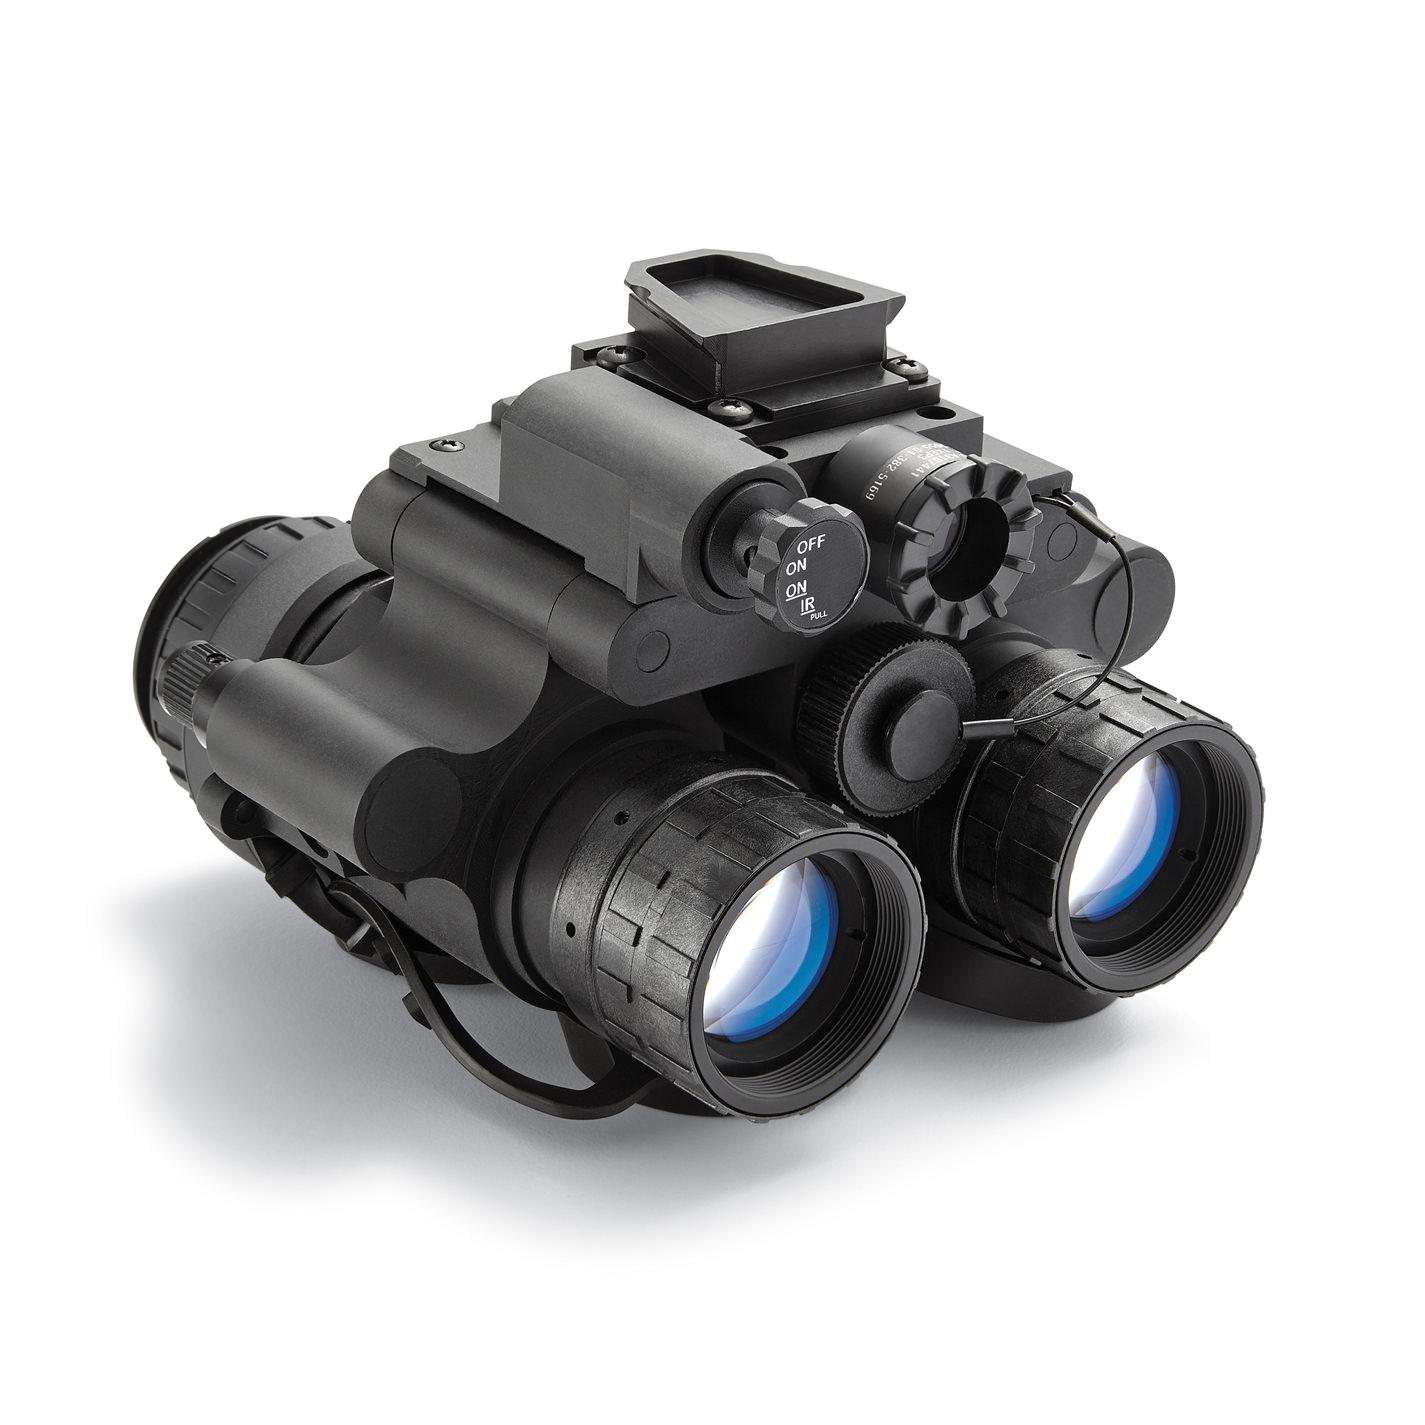 BNVDG Night Vision Binocular - Dual Gain